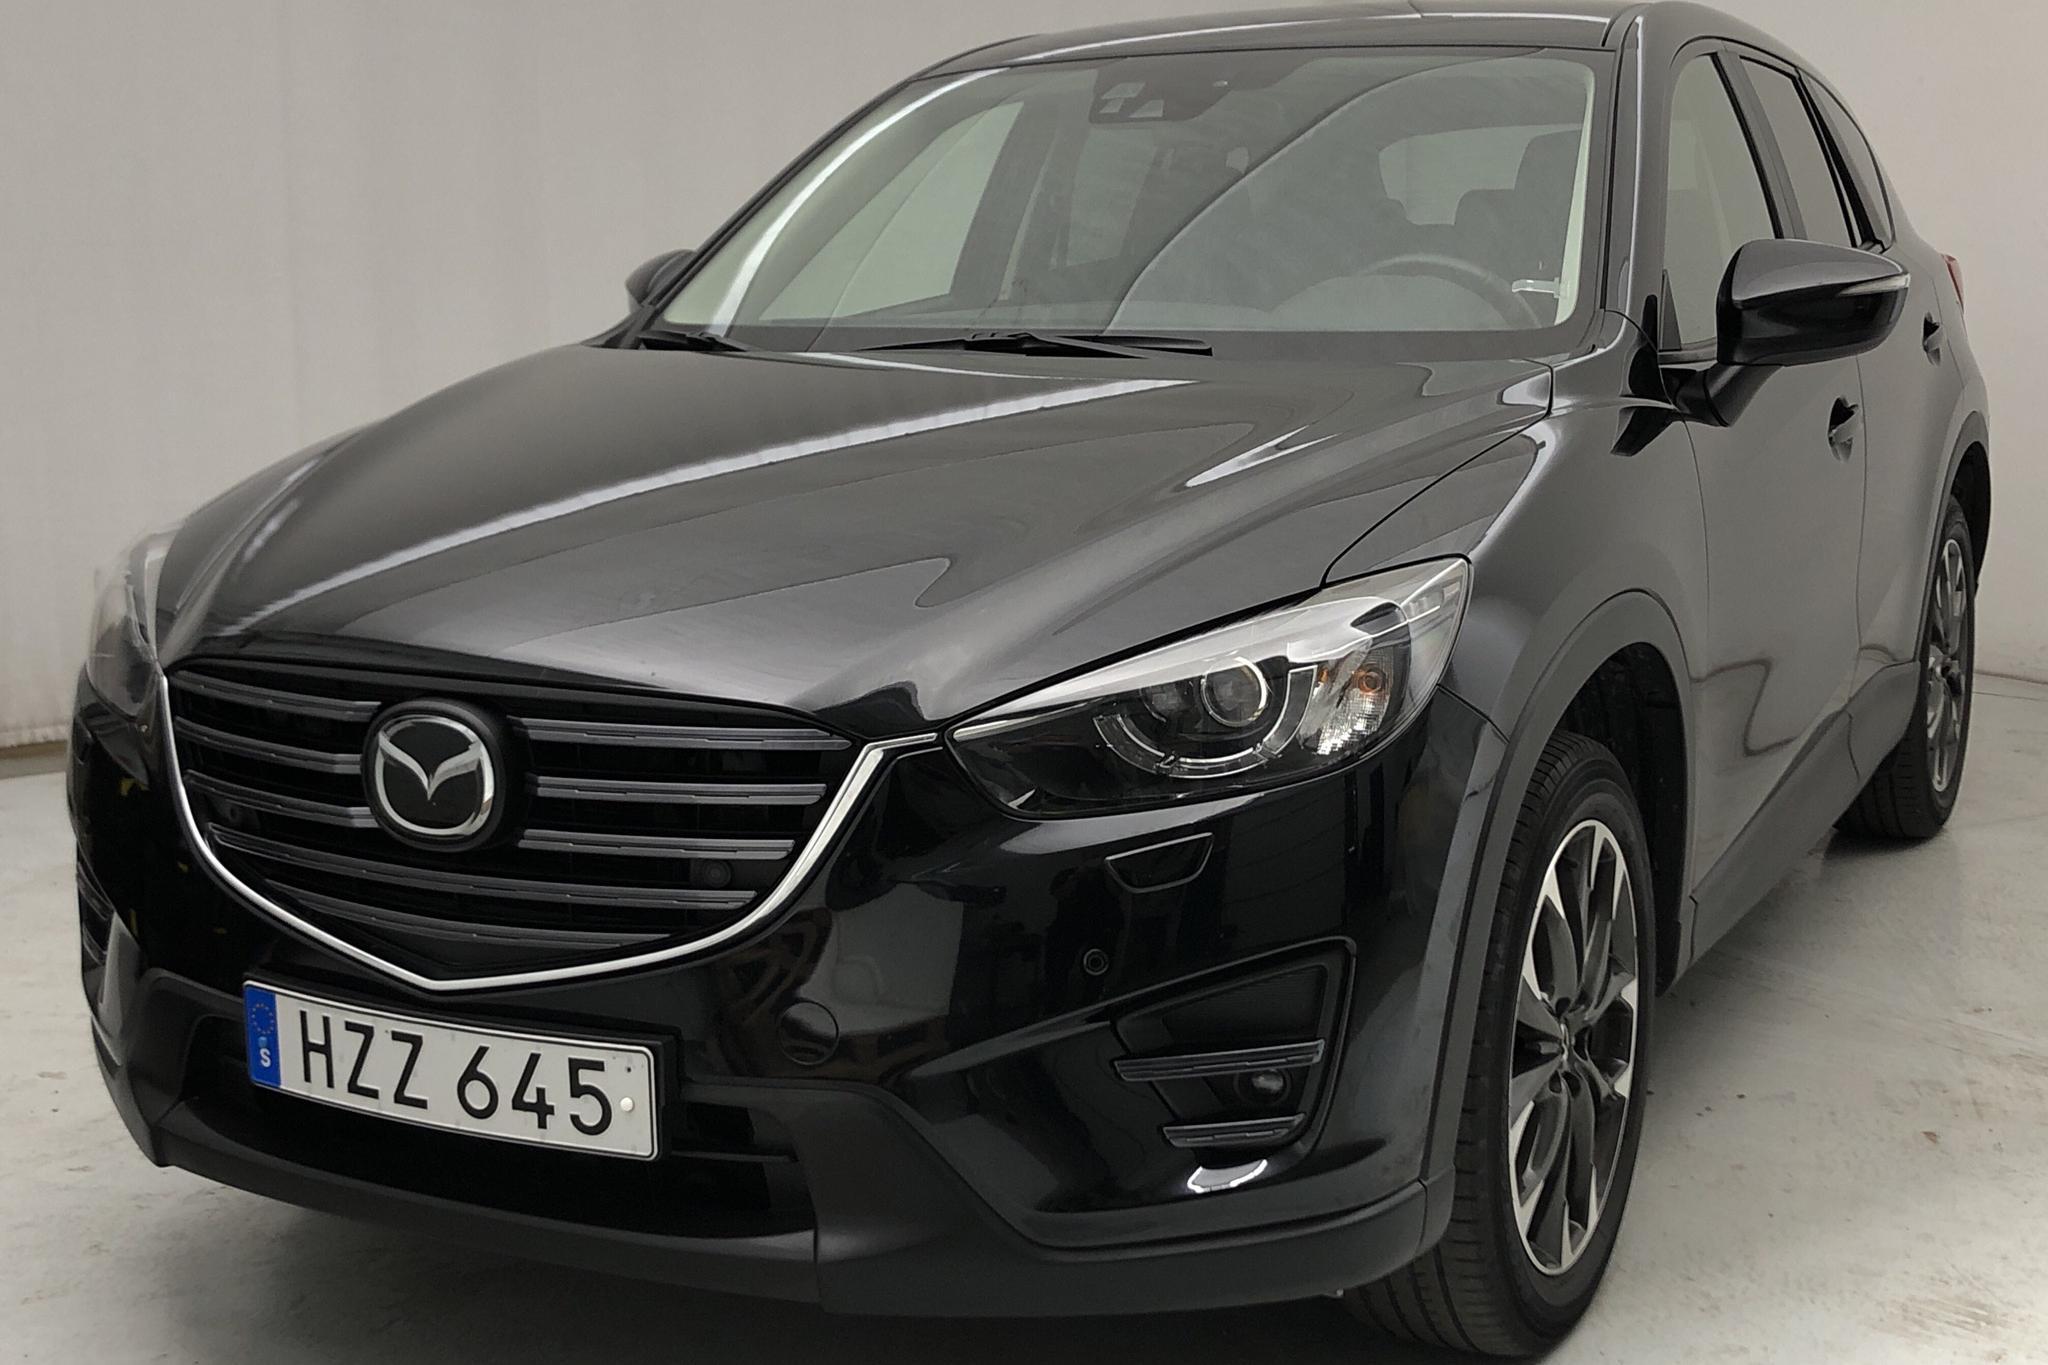 Mazda CX-5 2.5 AWD (192hk) - 72 910 km - Automatic - black - 2015